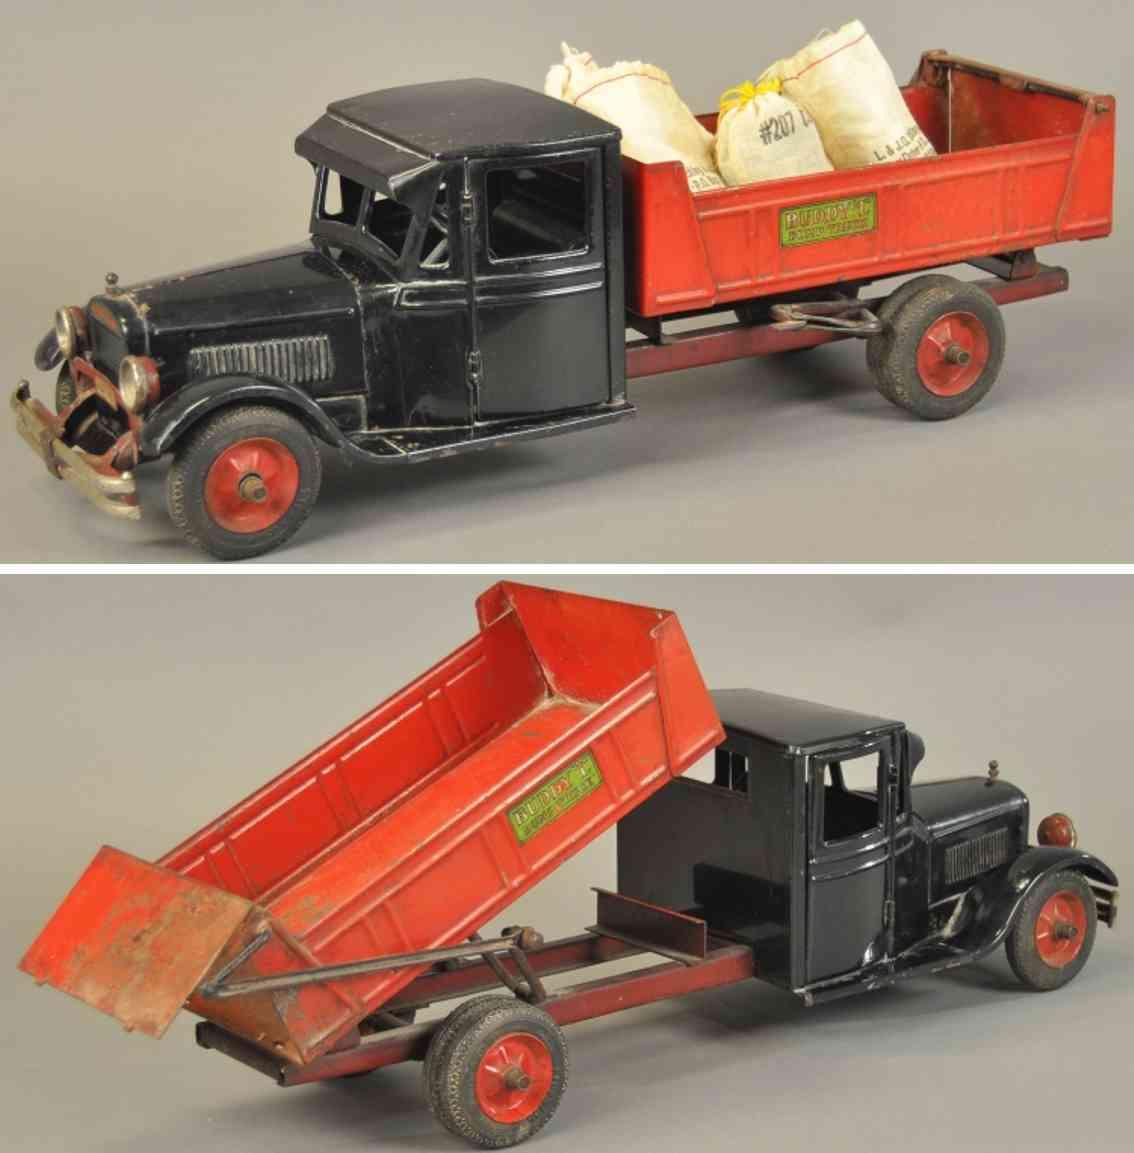 buddy l blech spielzeug kipplastwagen junior serie rot schwarz